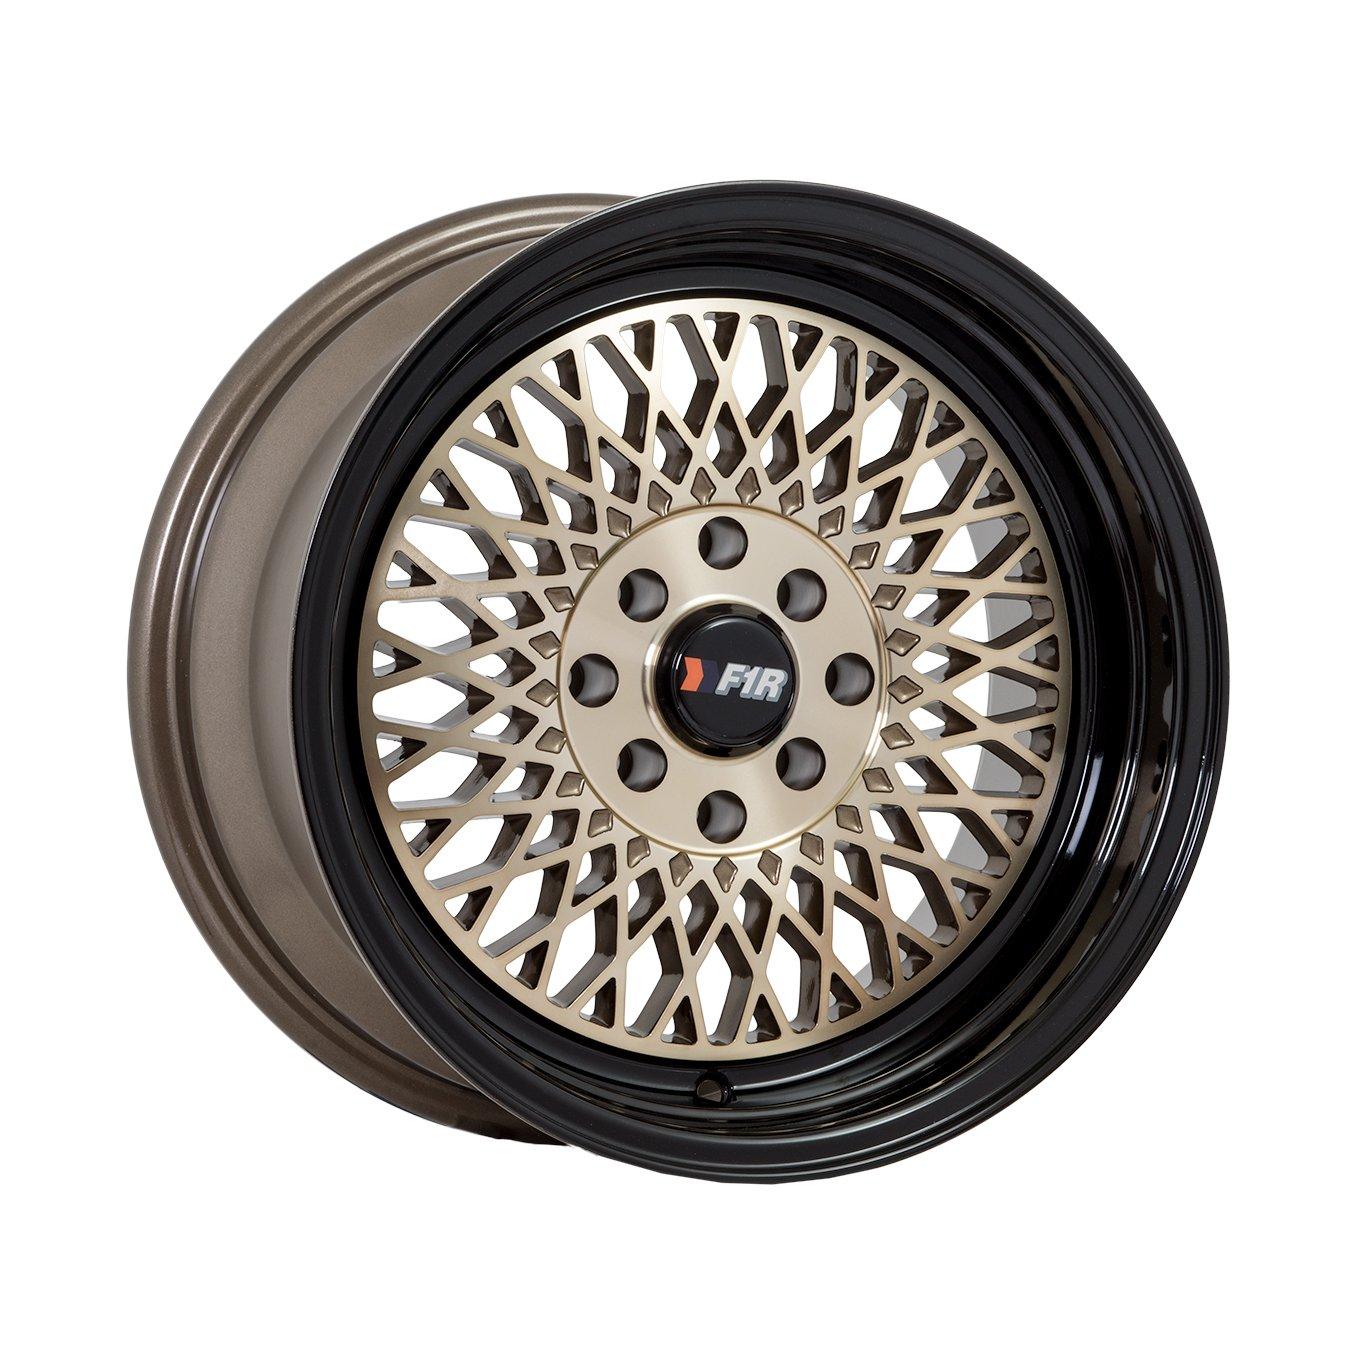 15x8 F1R F01 Bronze w/ Black Lip Rim Offset(0) Lug(4x100/4x114.3) Bore(67.1) 1 Wheel -- F01158BZ0